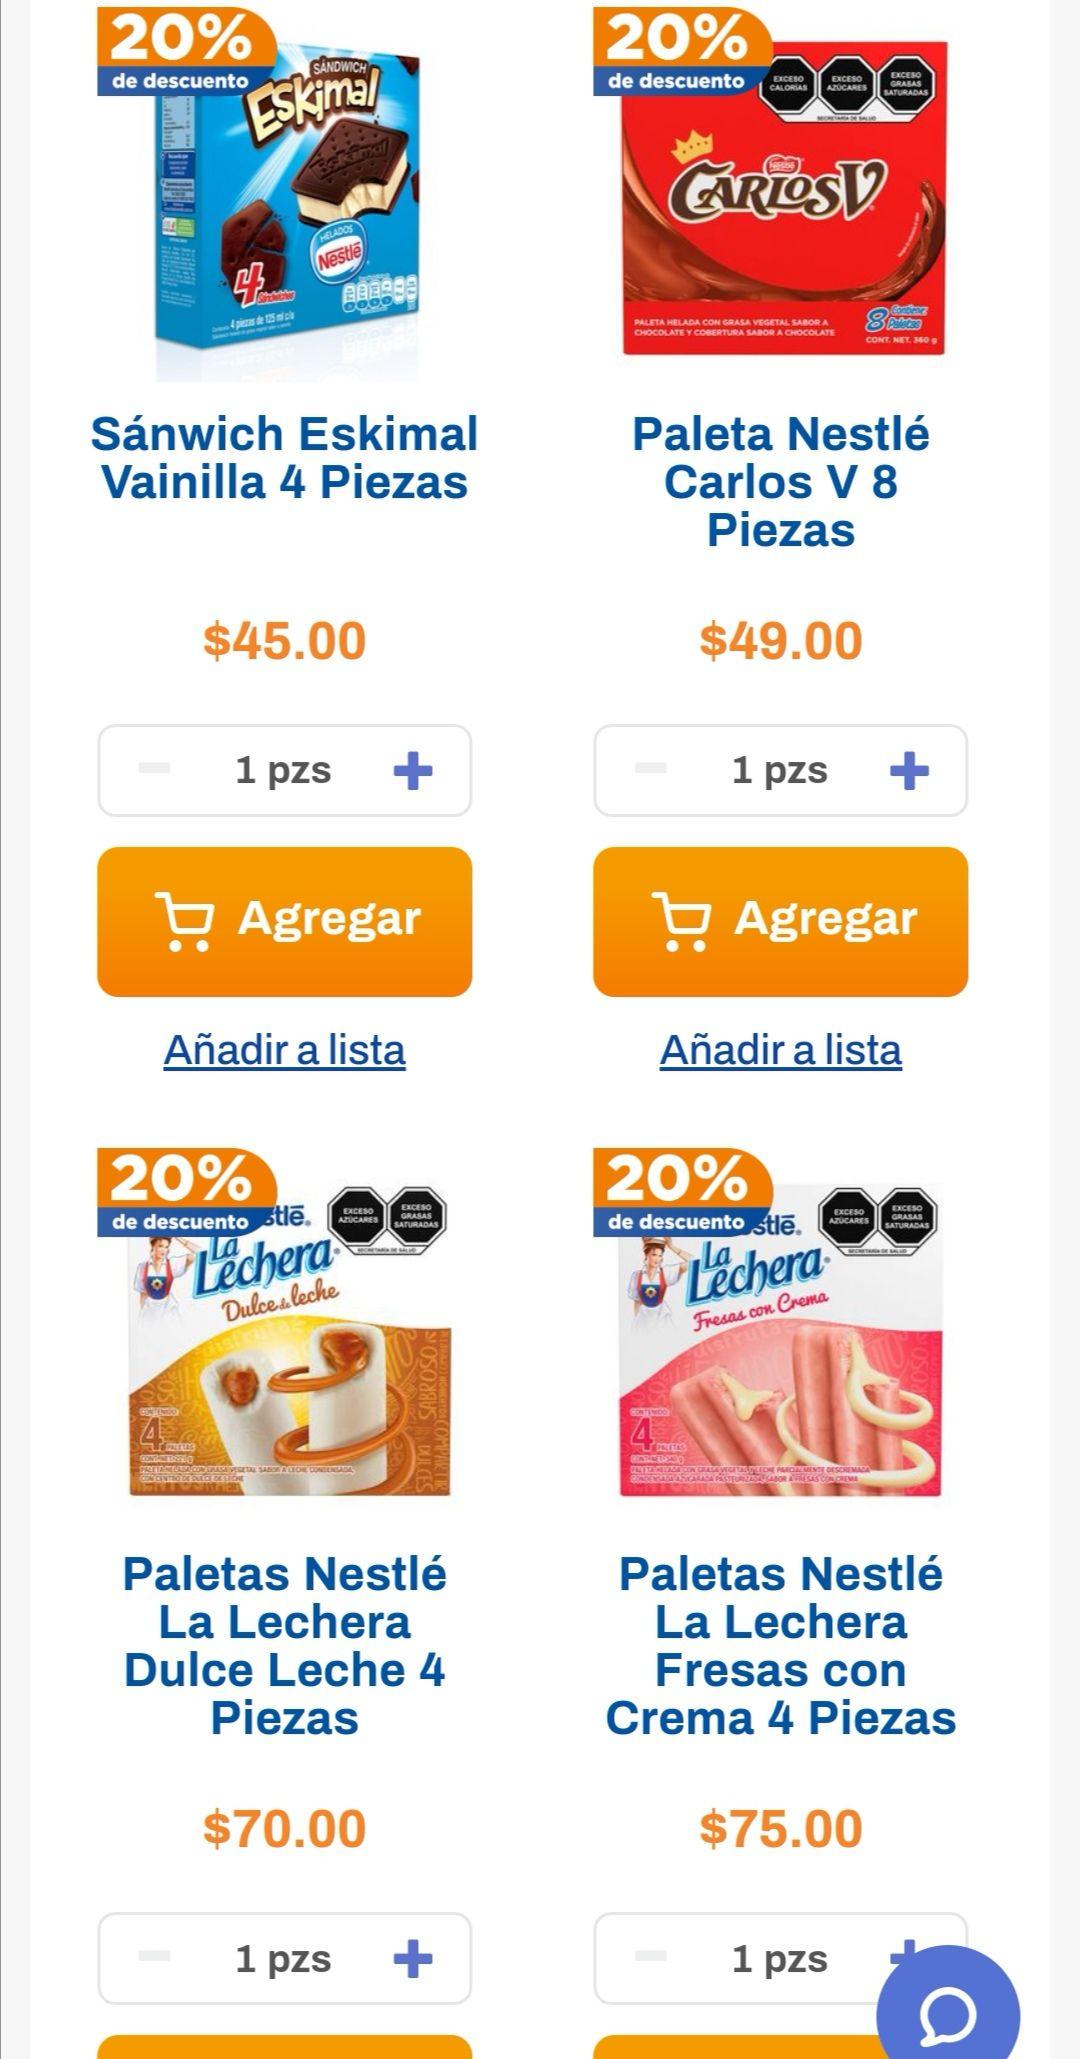 Chedraui: 20% de descuento en la compra a partir de 2 Multipacks de paletas Nestlé